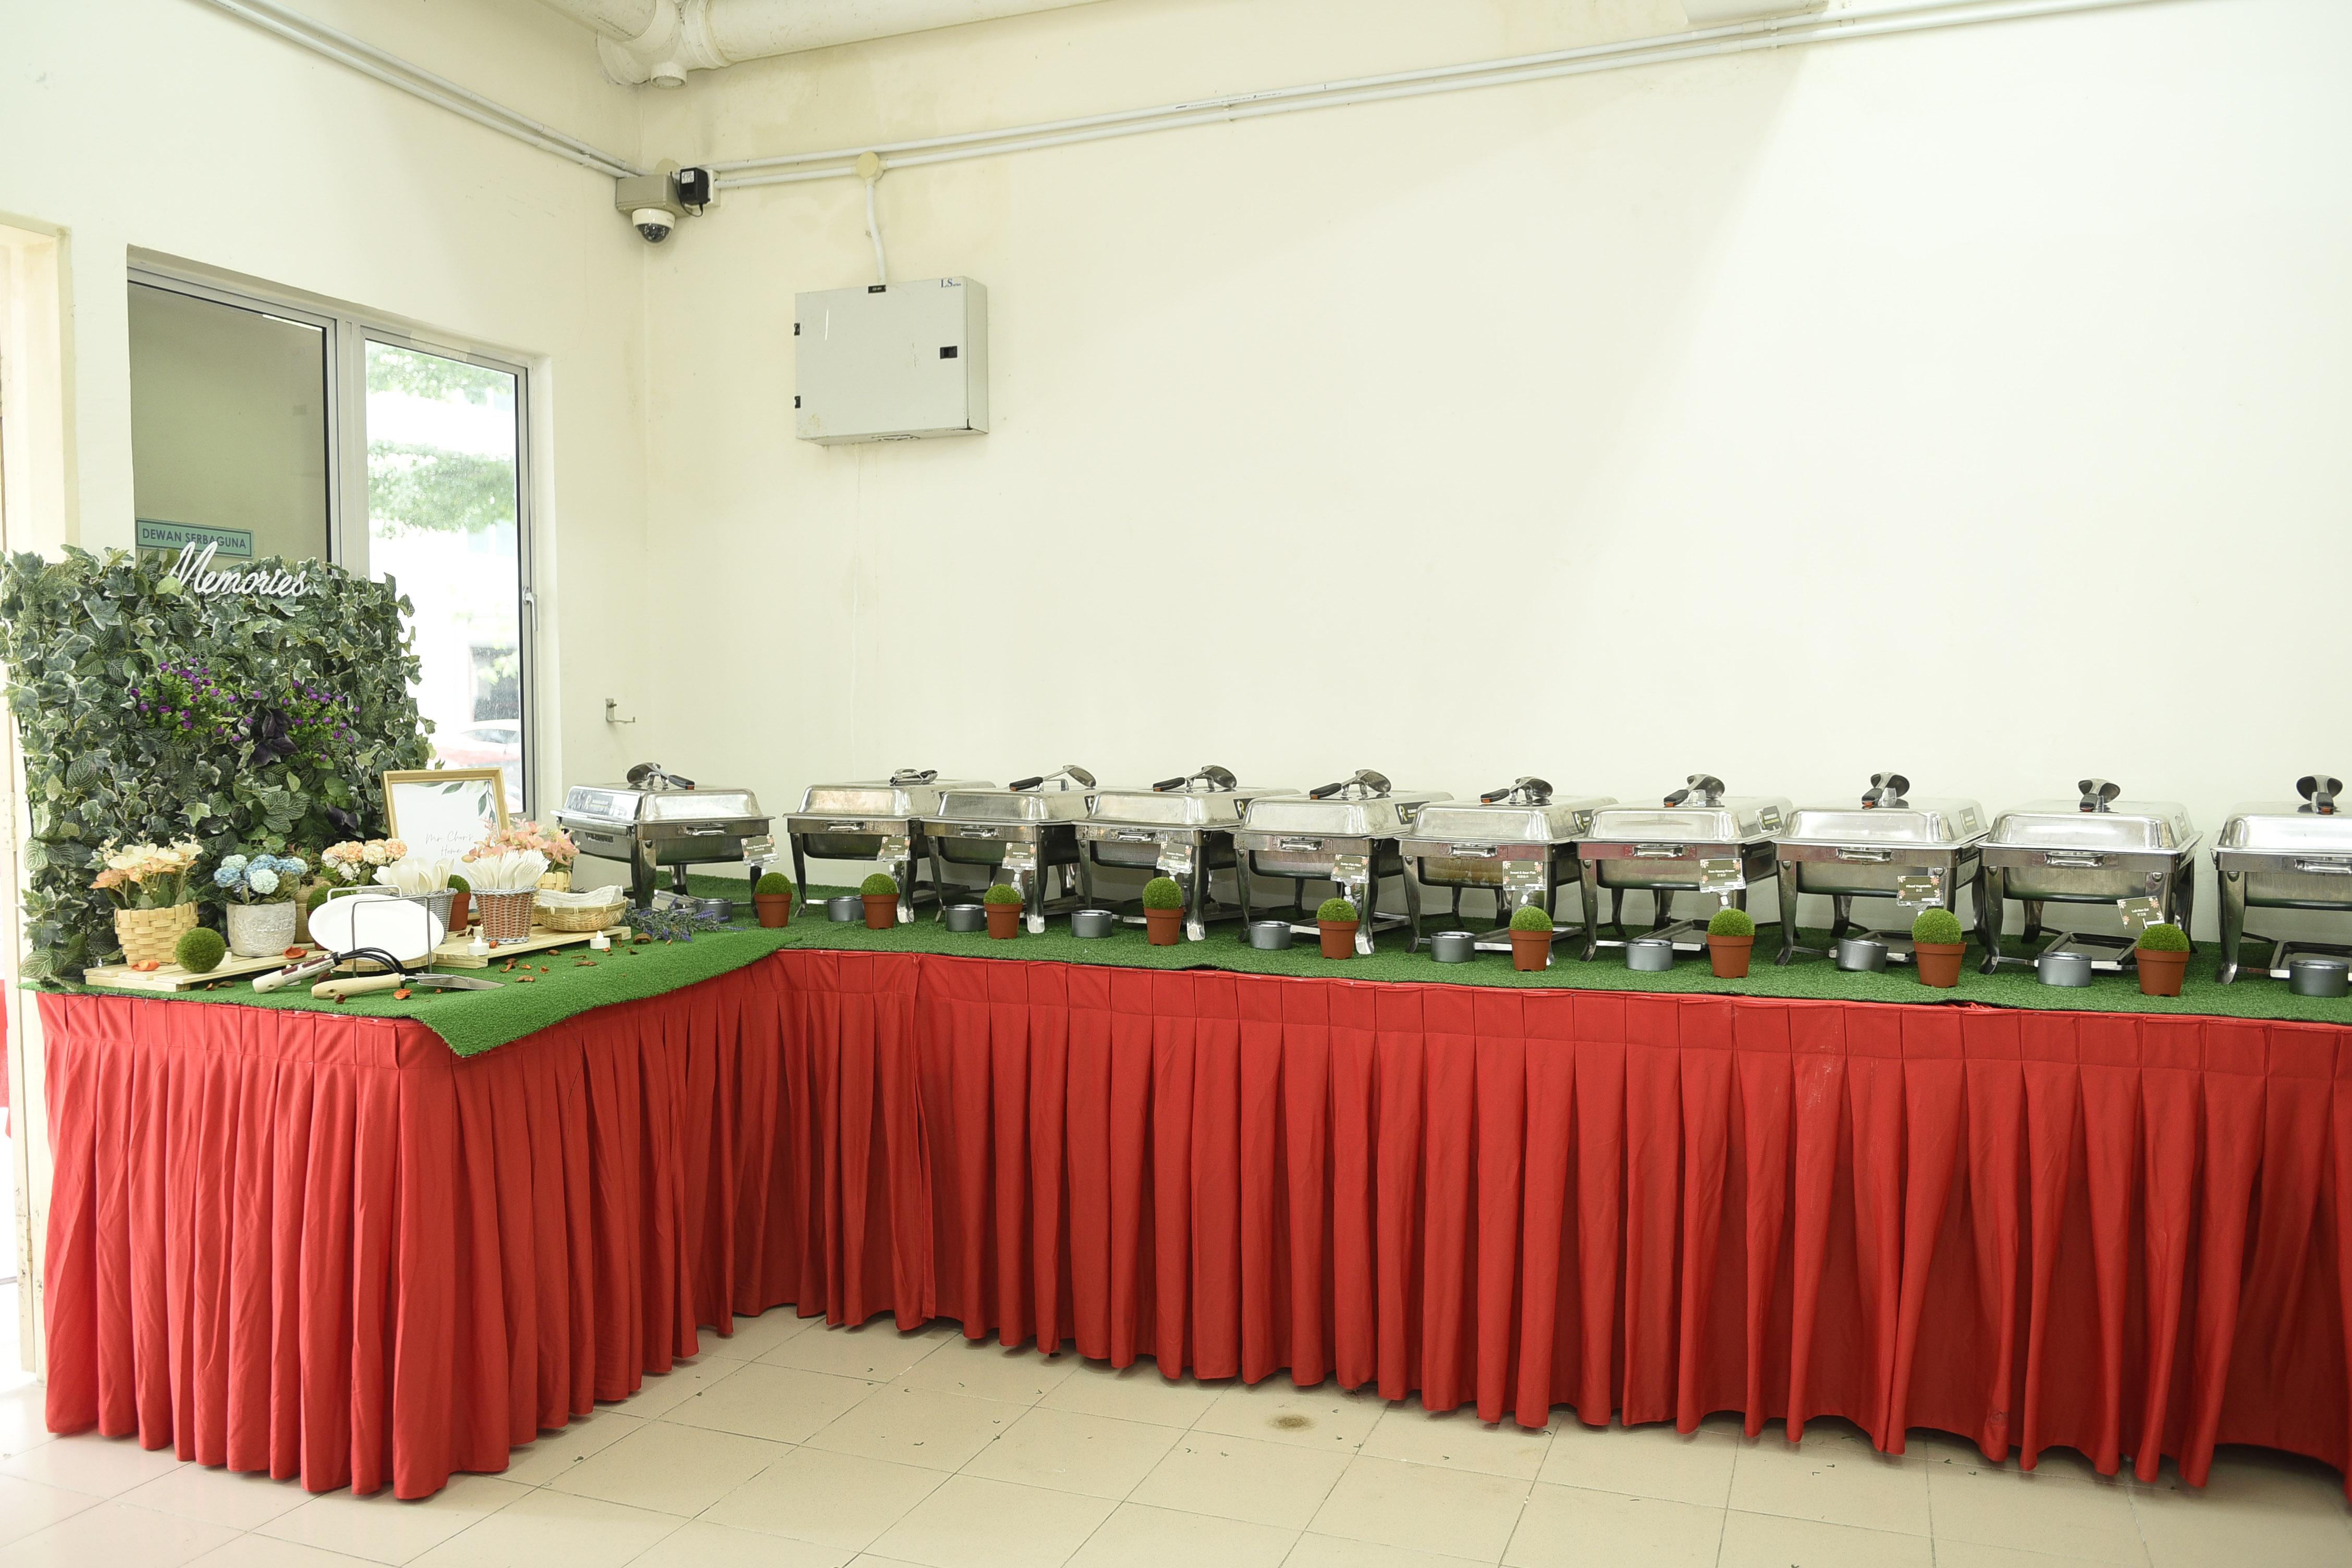 runningmen catering buffet line setup with grass base